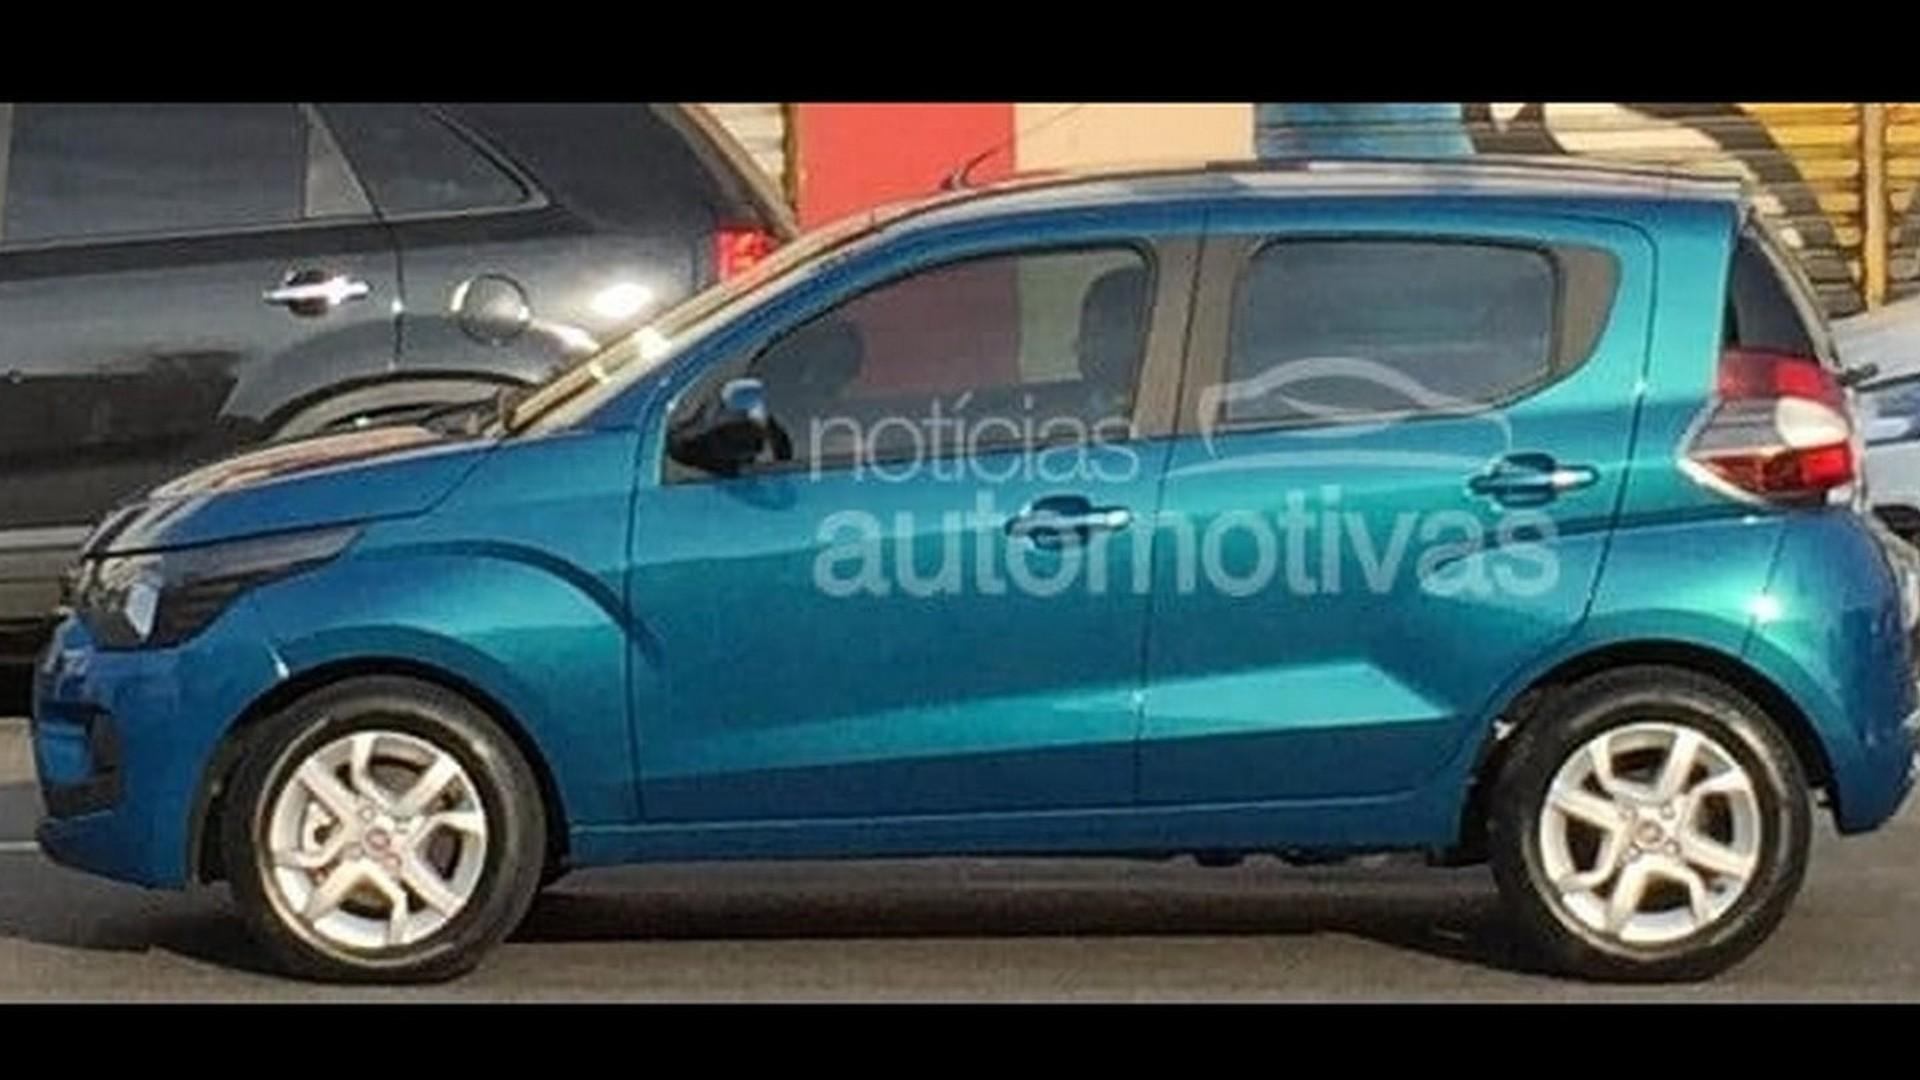 Fiat Mobi city car spied undisguised